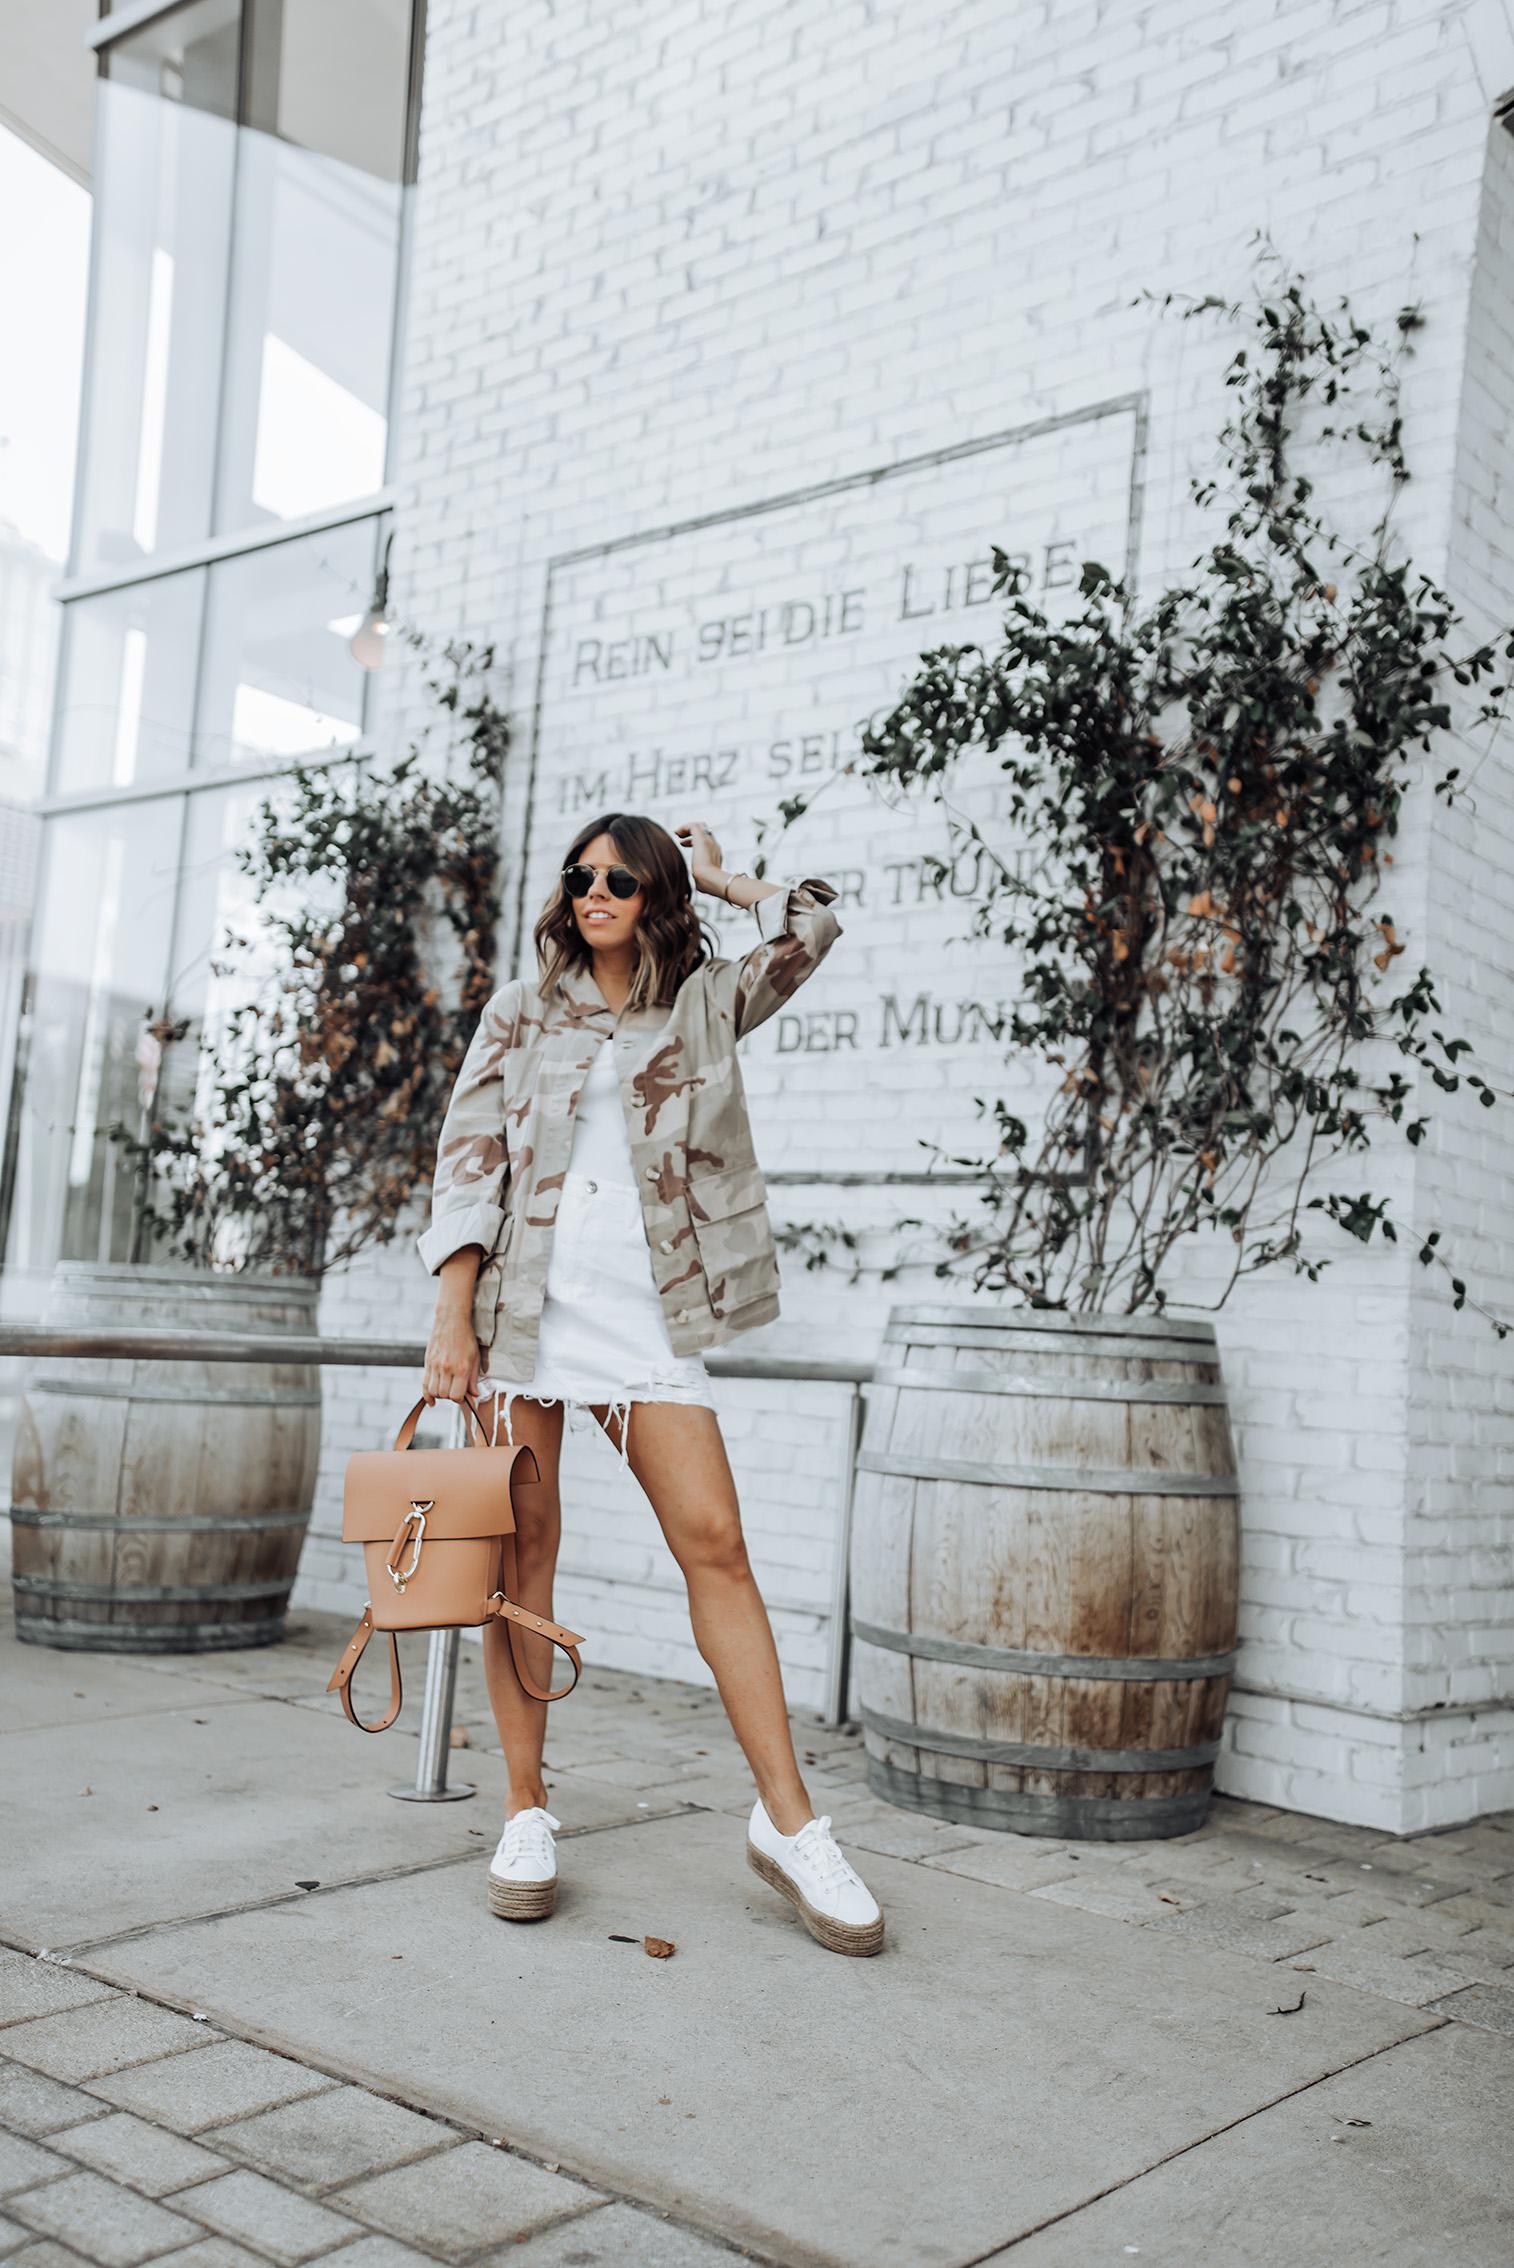 Topshop Camo Print Jacket | camo |Denim skirt | Zac Zac Posen Belay Backpack | Superga Flatform Sneakers | #sneakeroutfits #streetstyle #summeroutfits #liketkit #zaczacposen